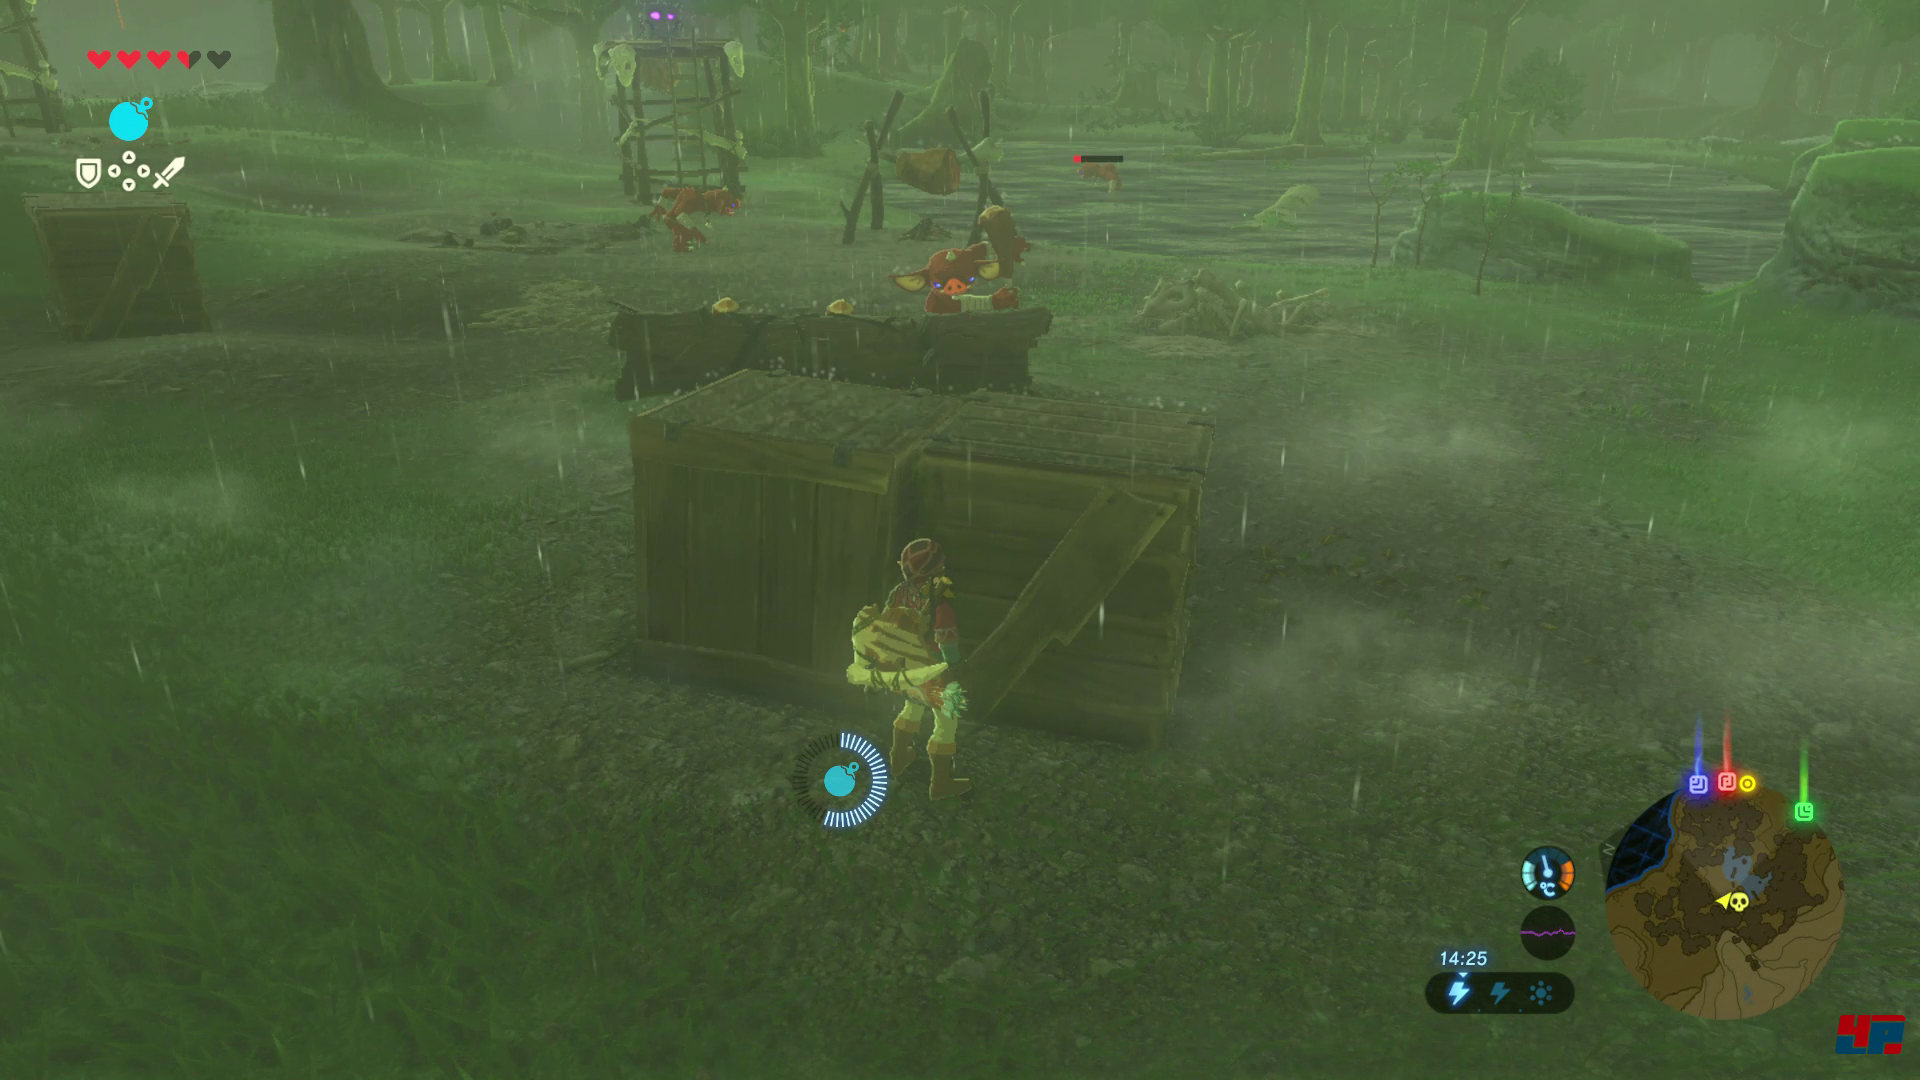 Screenshot The Legend of Zelda Breath of the Wild Switch